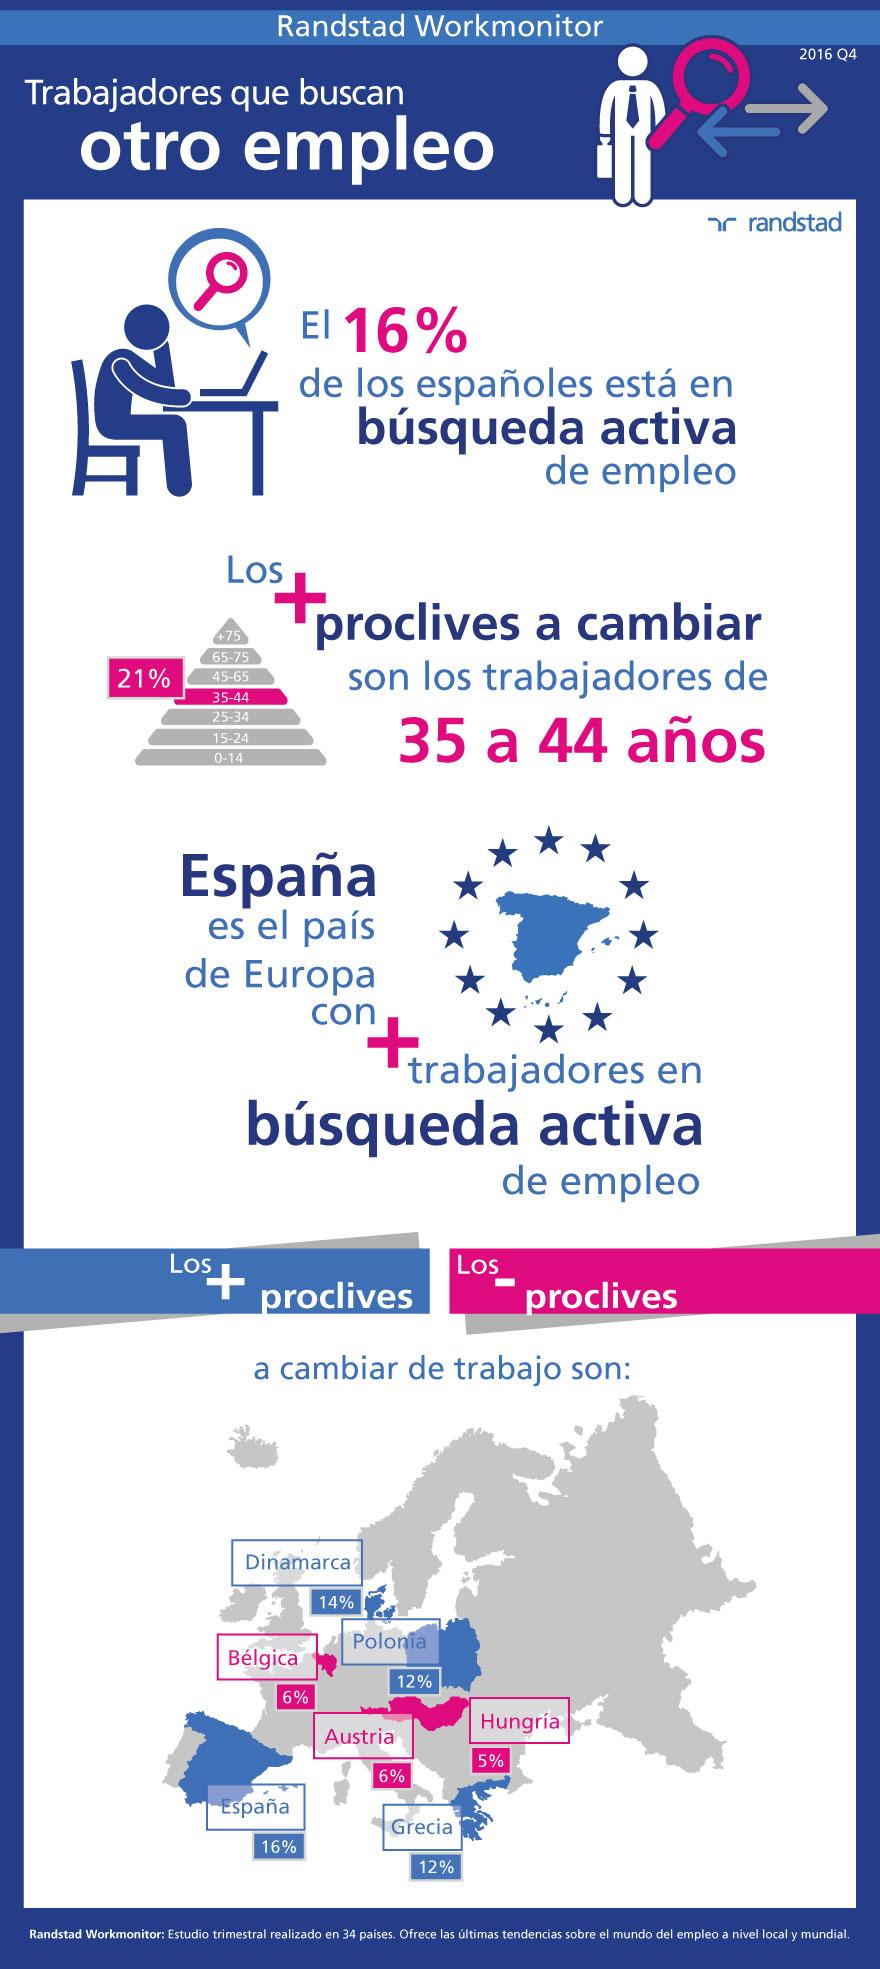 infografía Randstad Workmonitor | búsqueda activa de empleo | Q4 2016